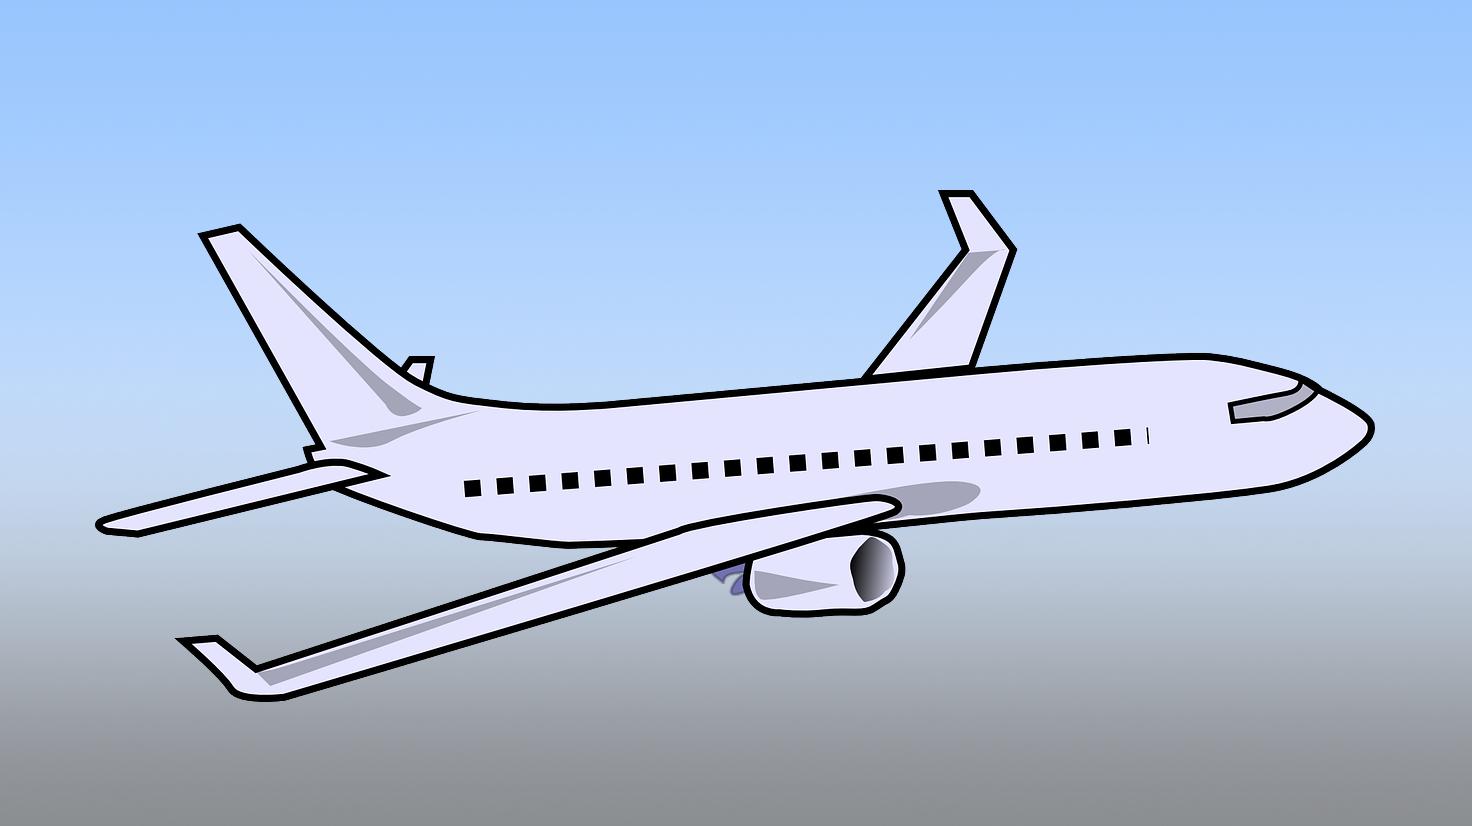 अन्तत: थप हवाई मार्ग दिन भारत सहमत